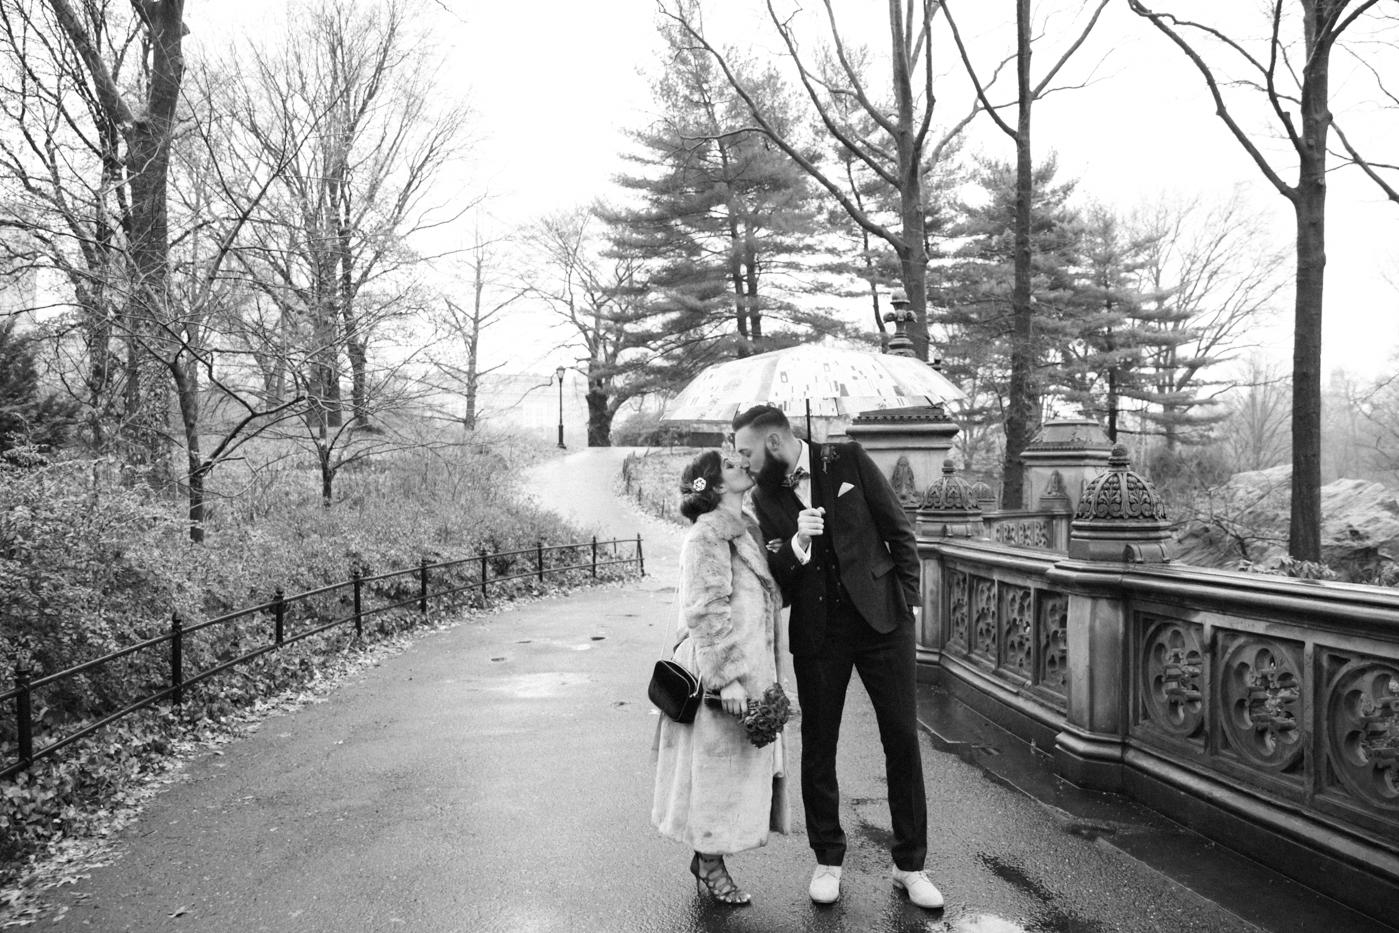 Central-park-wedding-by-Tanya-Isaeva-73.jpg